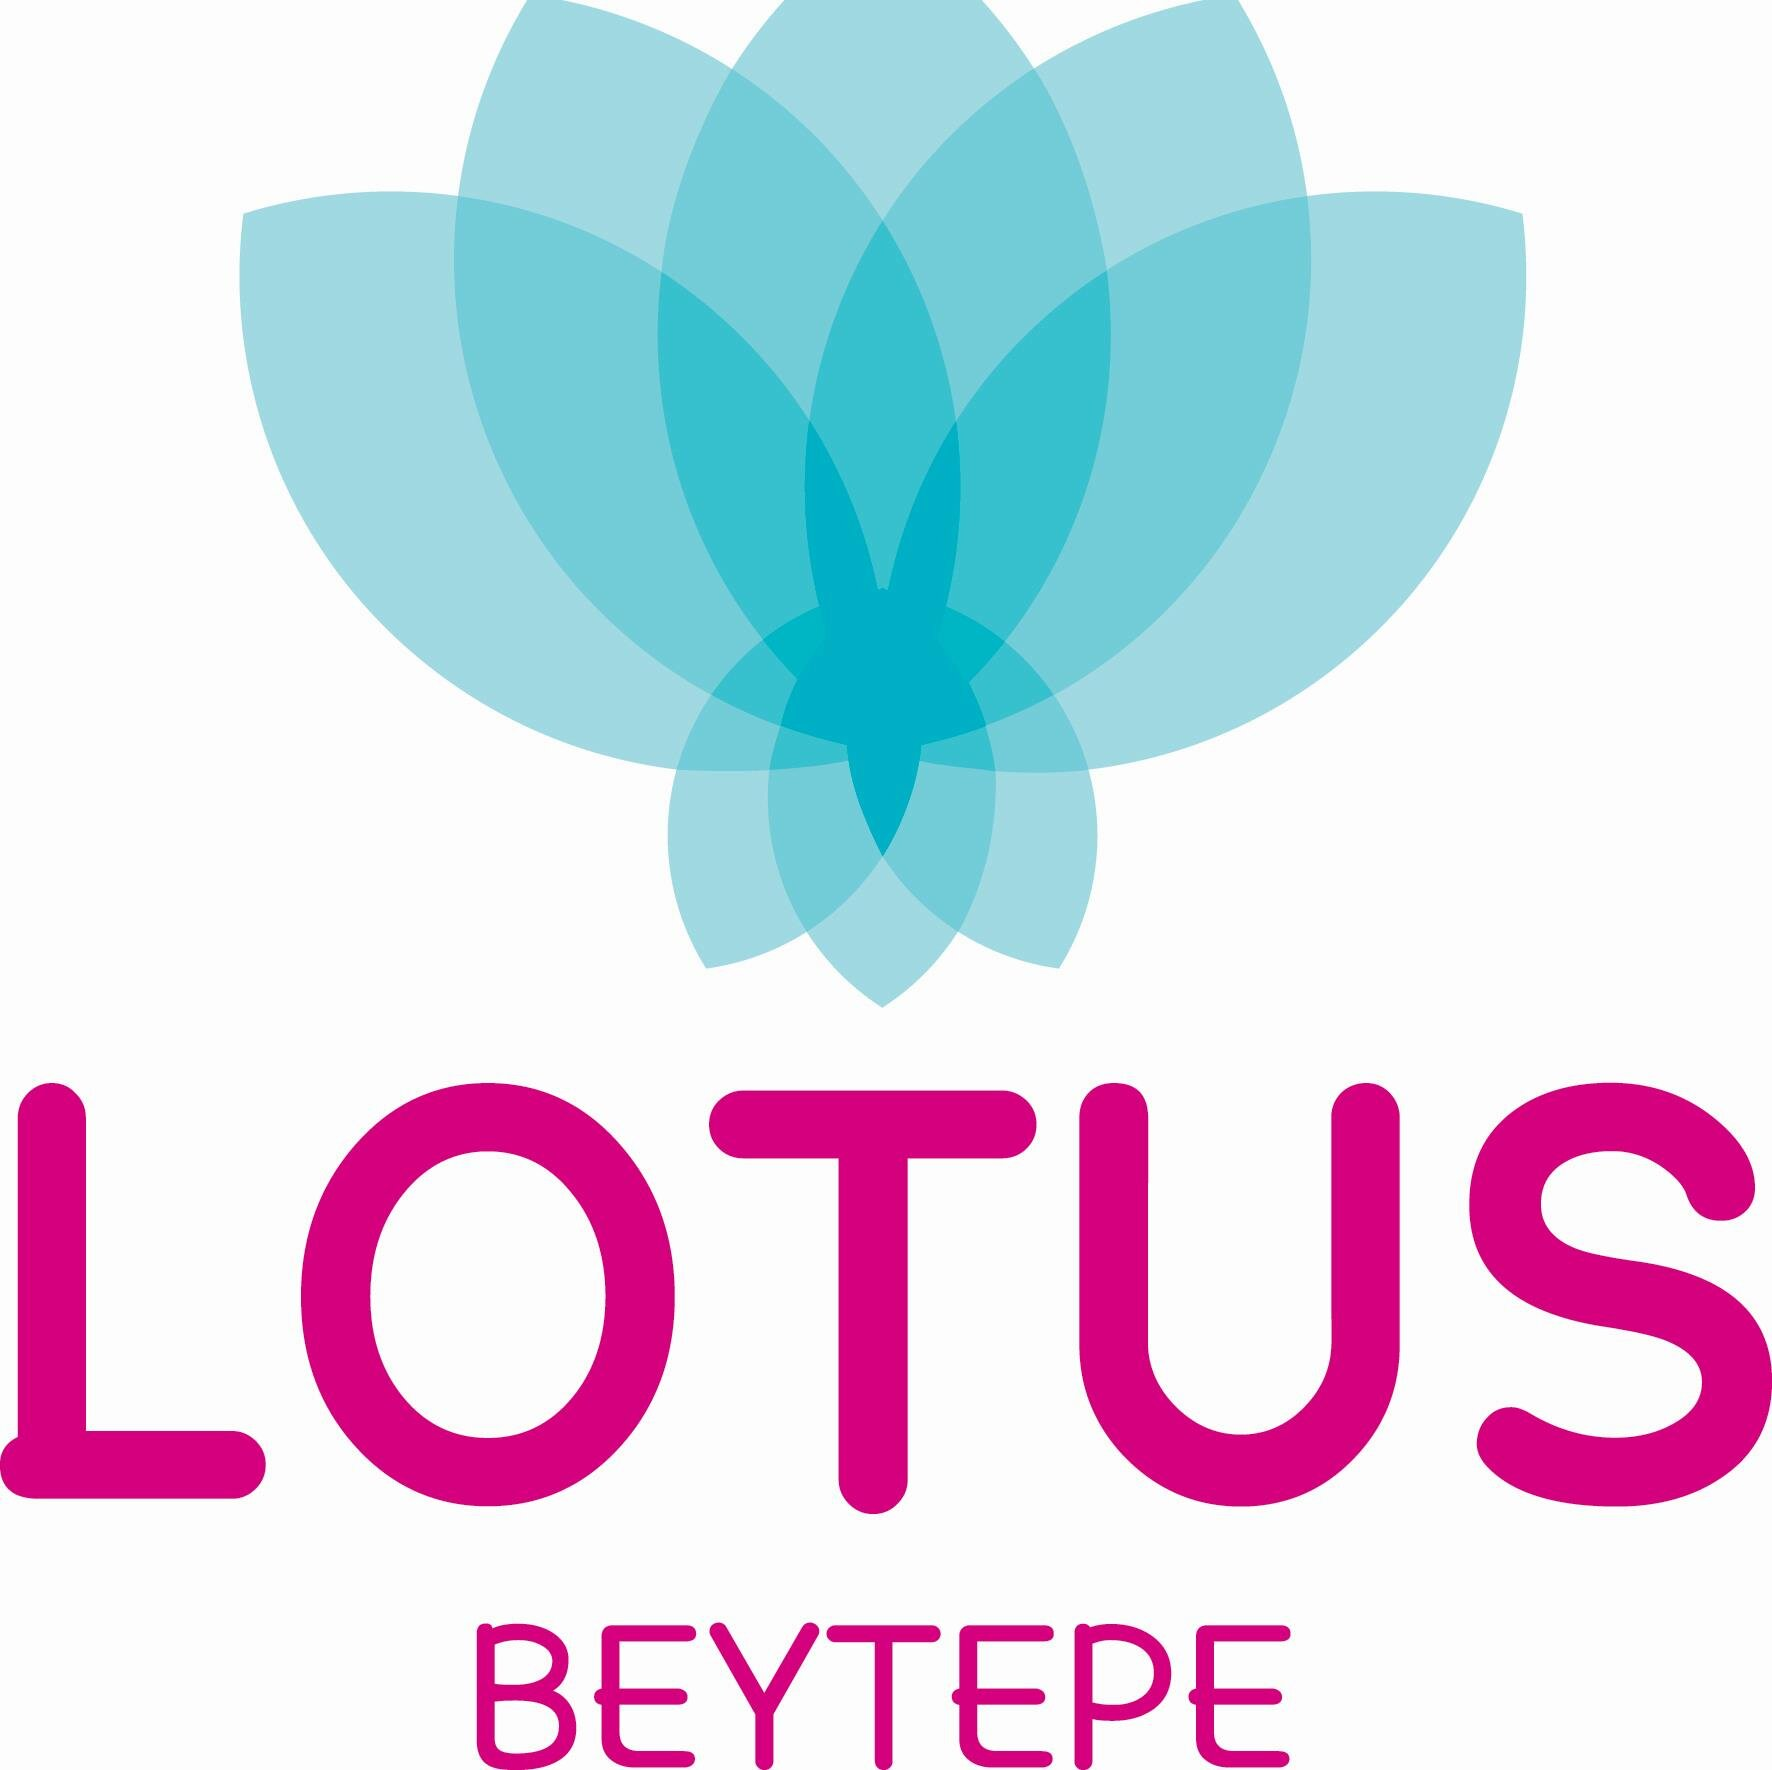 Lotus Beytepe  Twitter Hesabı Profil Fotoğrafı